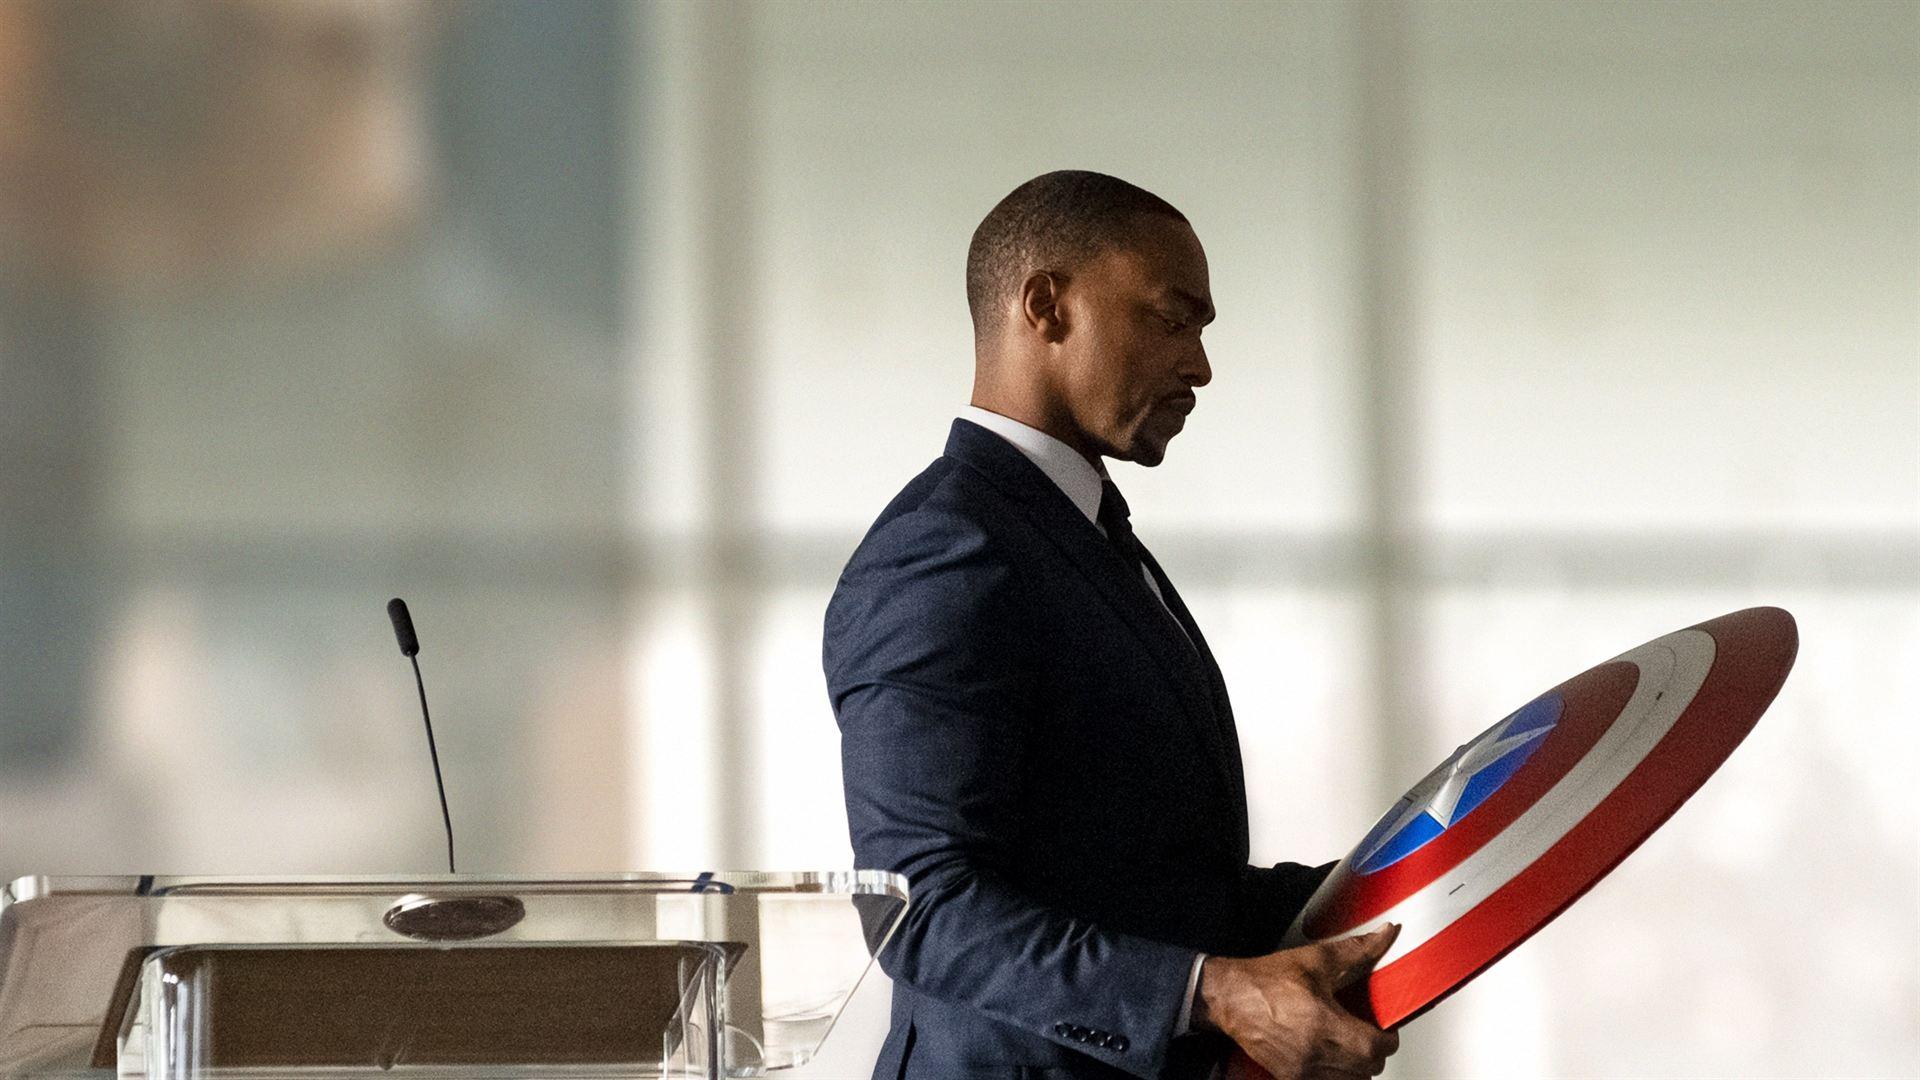 Sam wilson du The Falcon and The Winter Soldier tenant le bouclier de Captain America